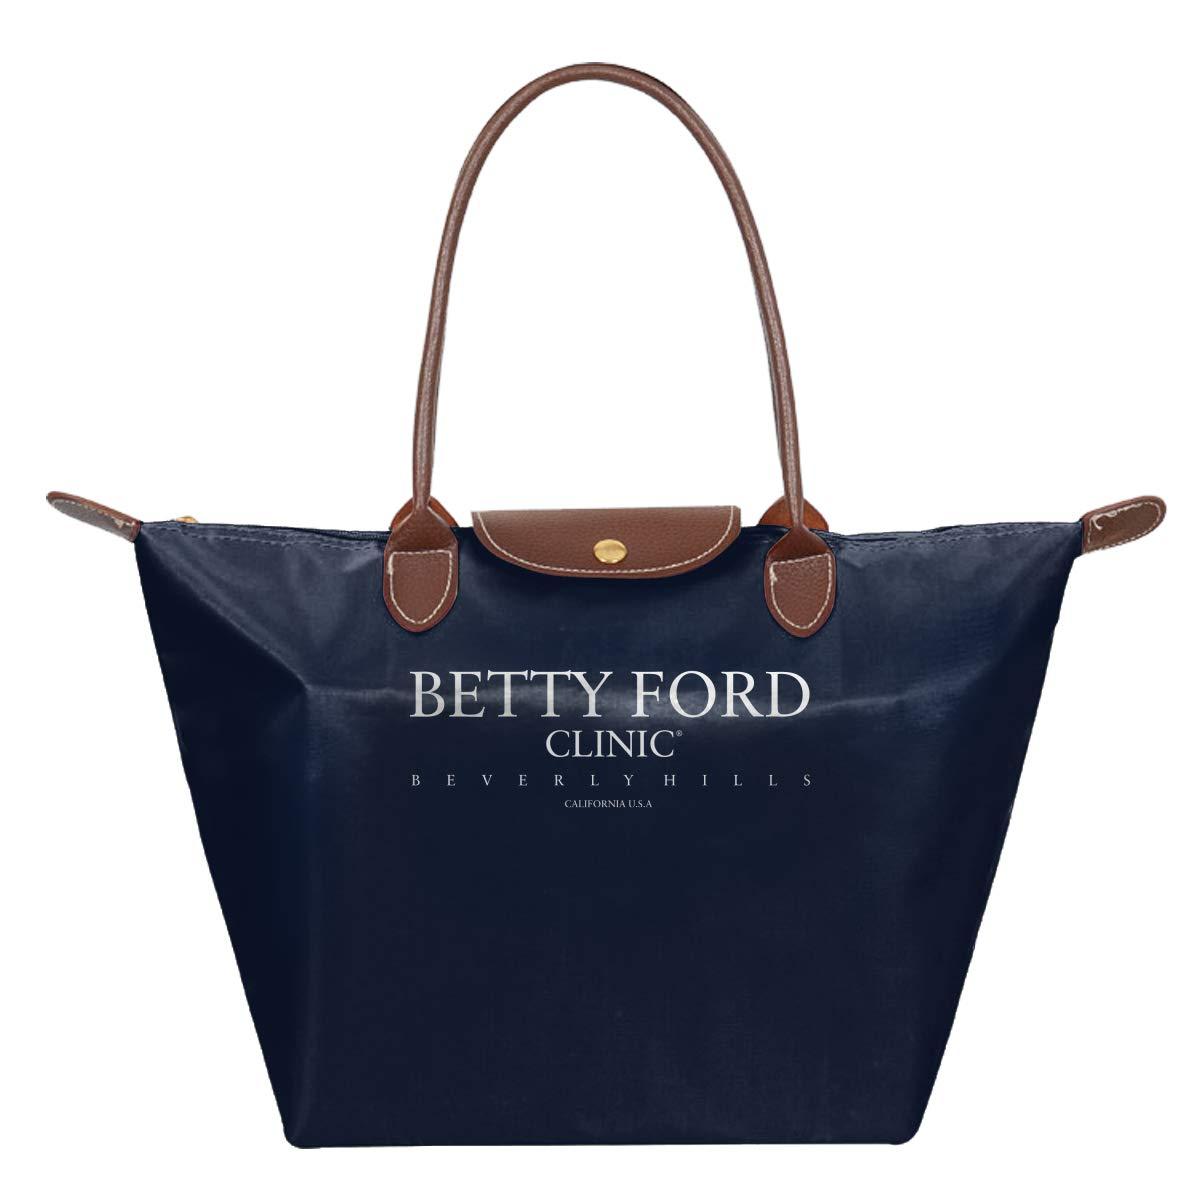 Betty Ford Clinic Waterproof Leather Folded Messenger Nylon Bag Travel Tote Hopping Folding School Handbags